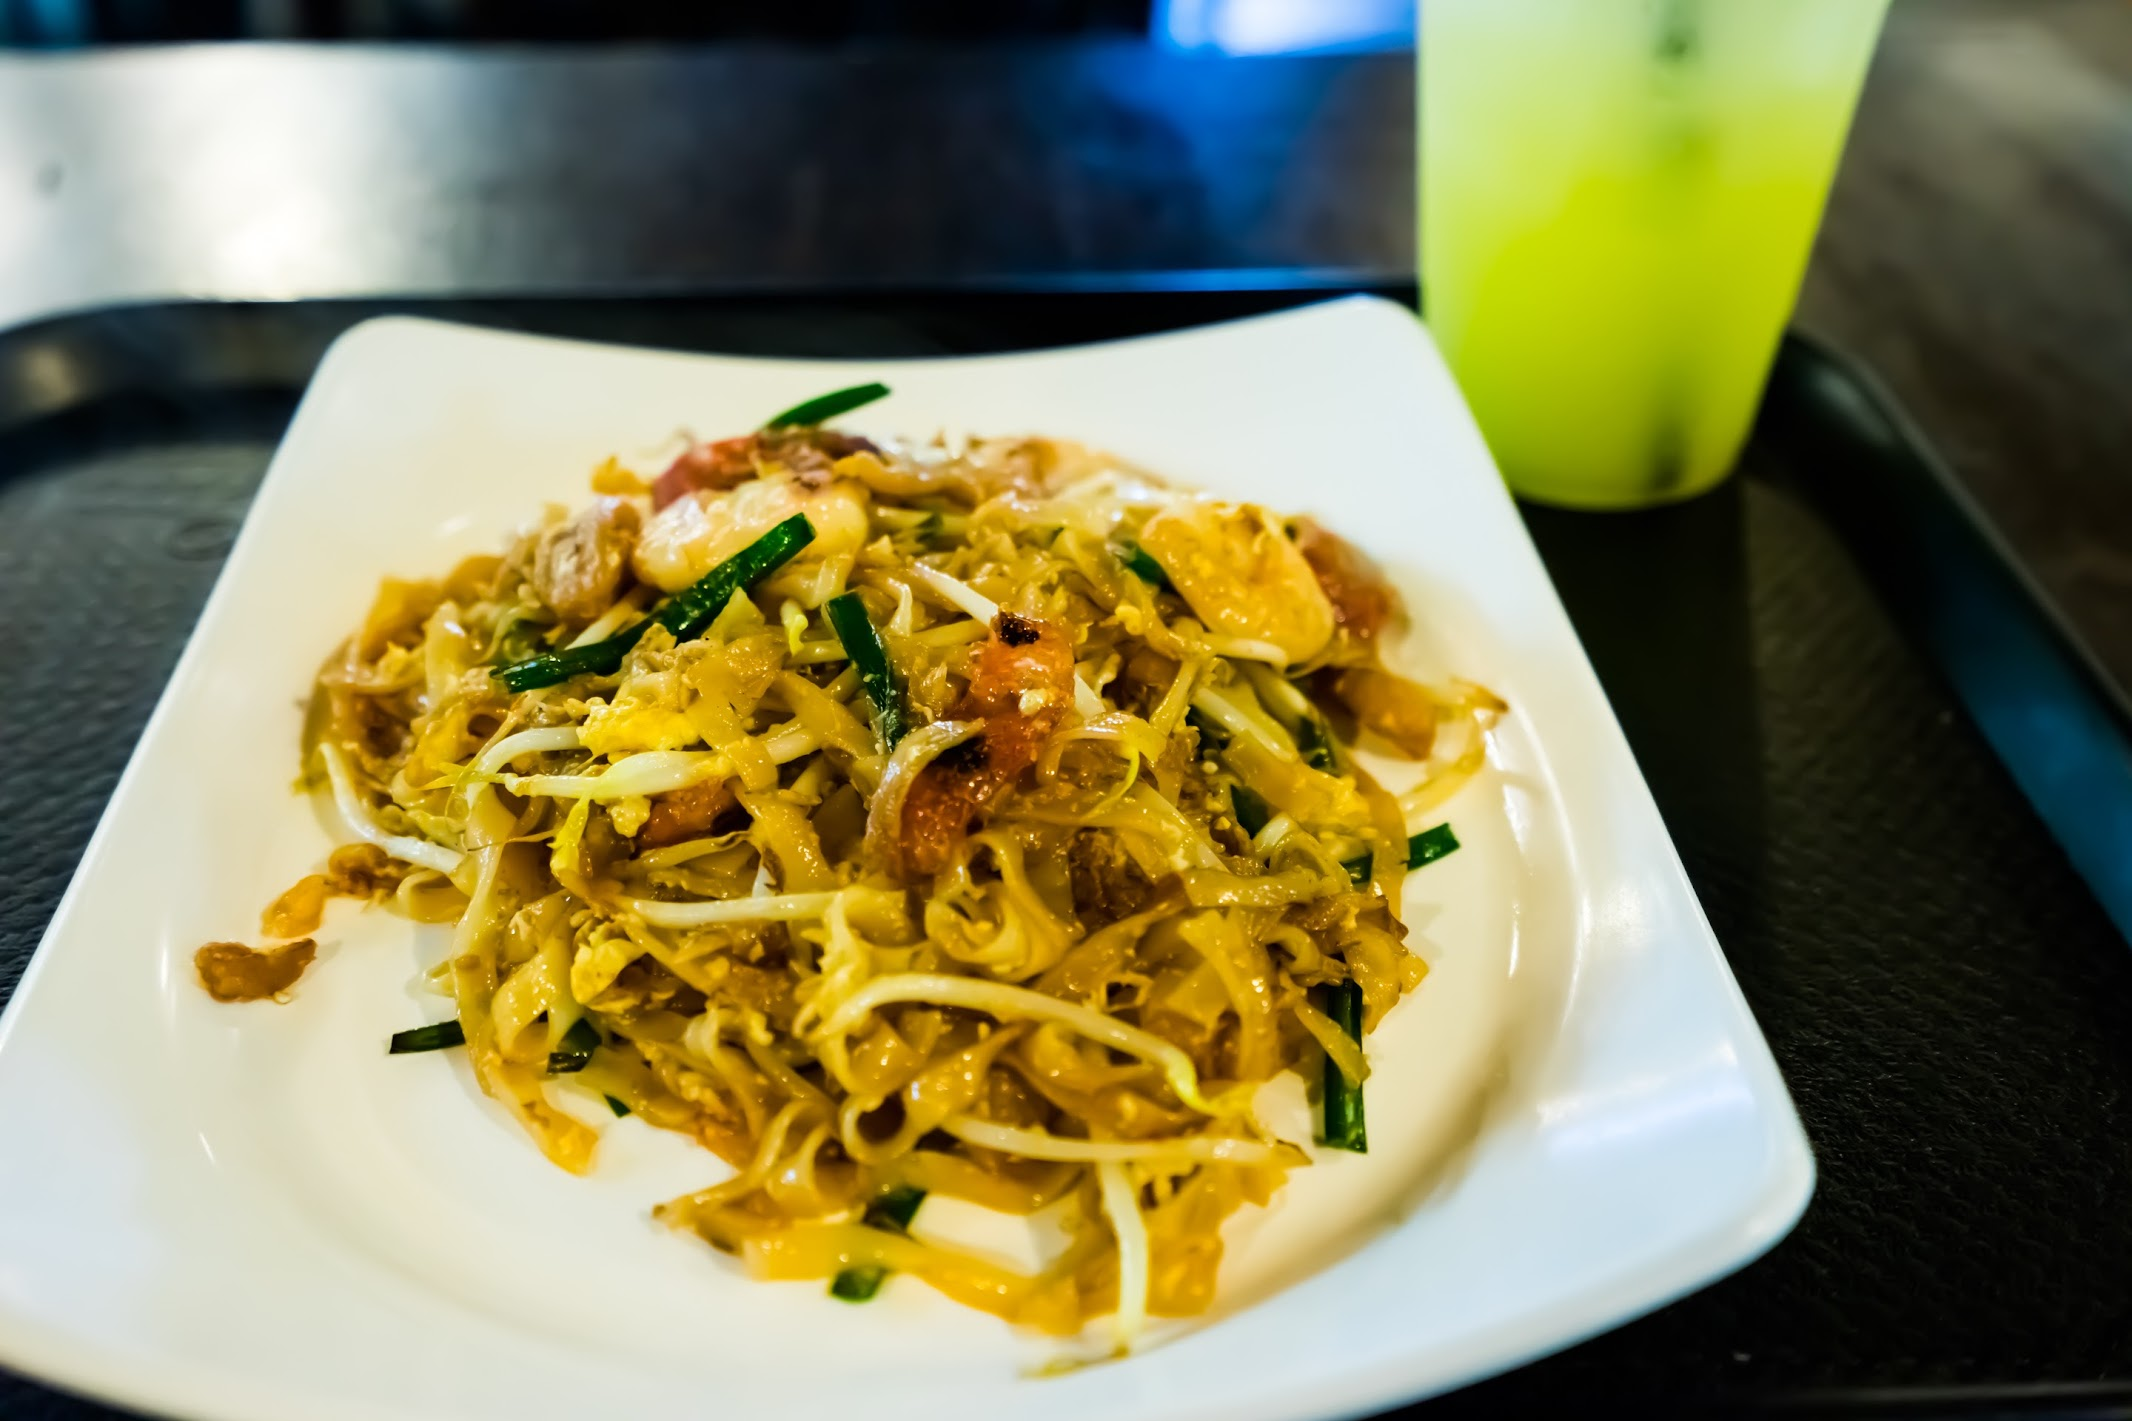 Singapore Sentosa Malaysian Food Street Penang Lim Brothers Char kway teow